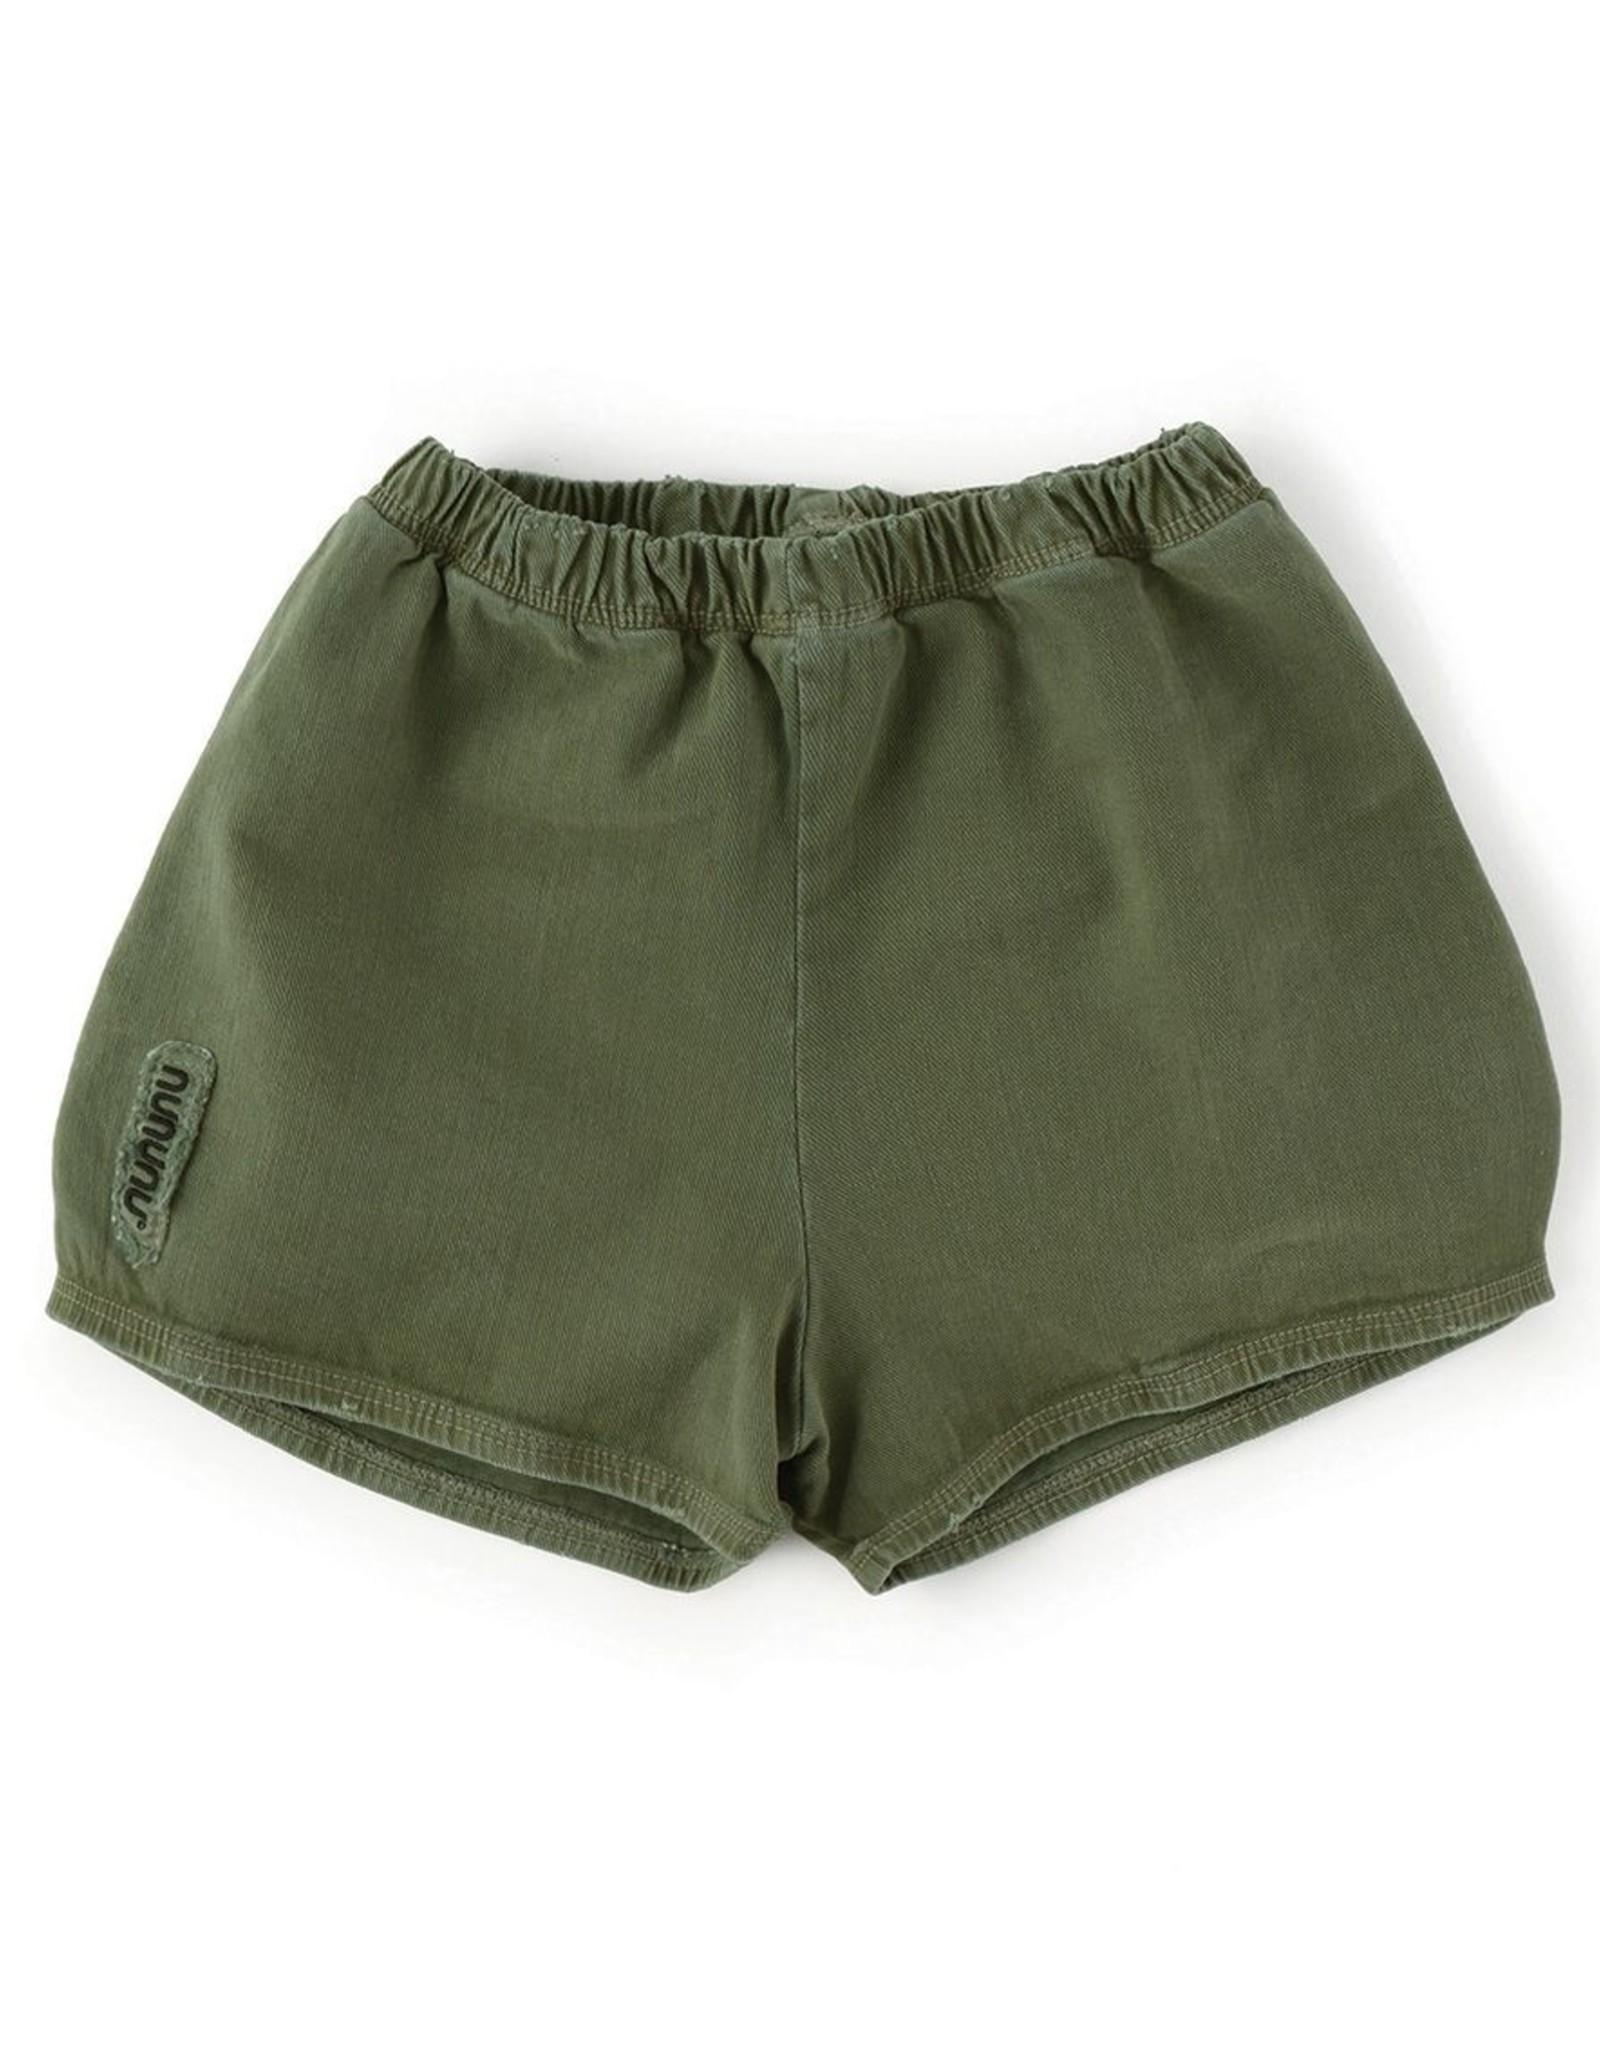 NUNUNU Nununu - Military Yoga Shorts